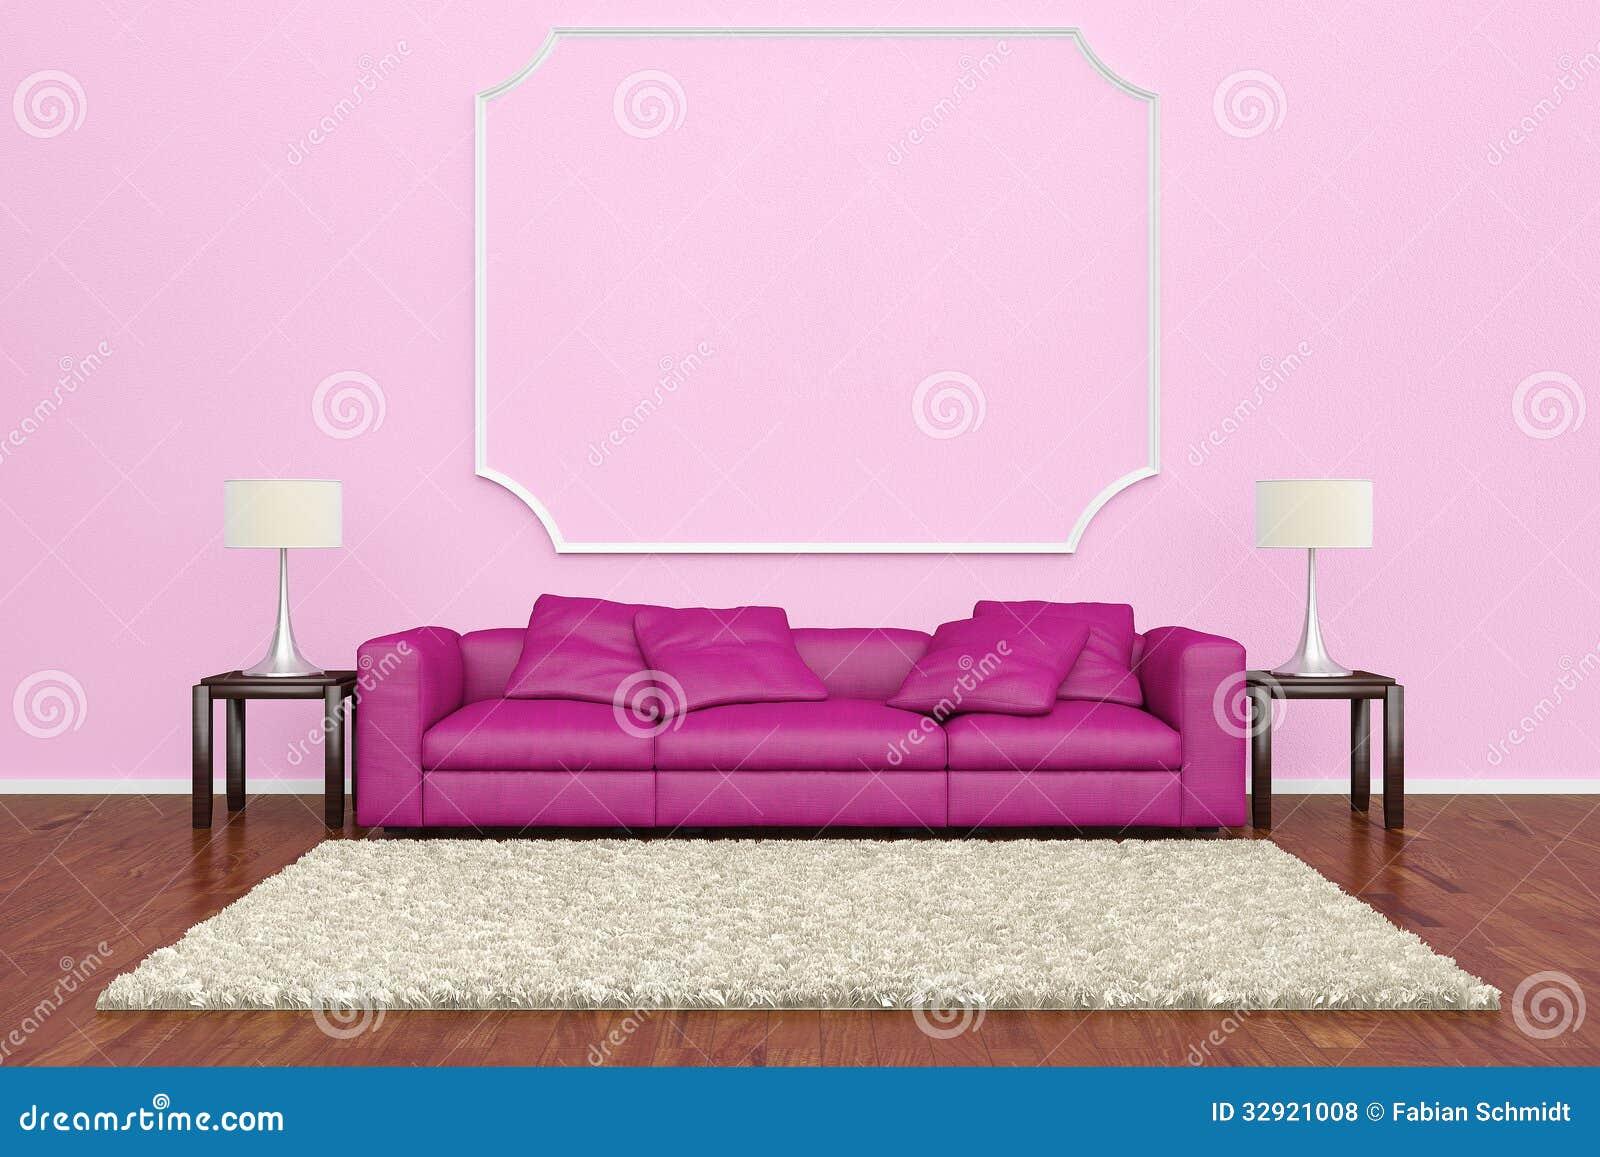 pink sofa with wall decoration stock illustration. Black Bedroom Furniture Sets. Home Design Ideas